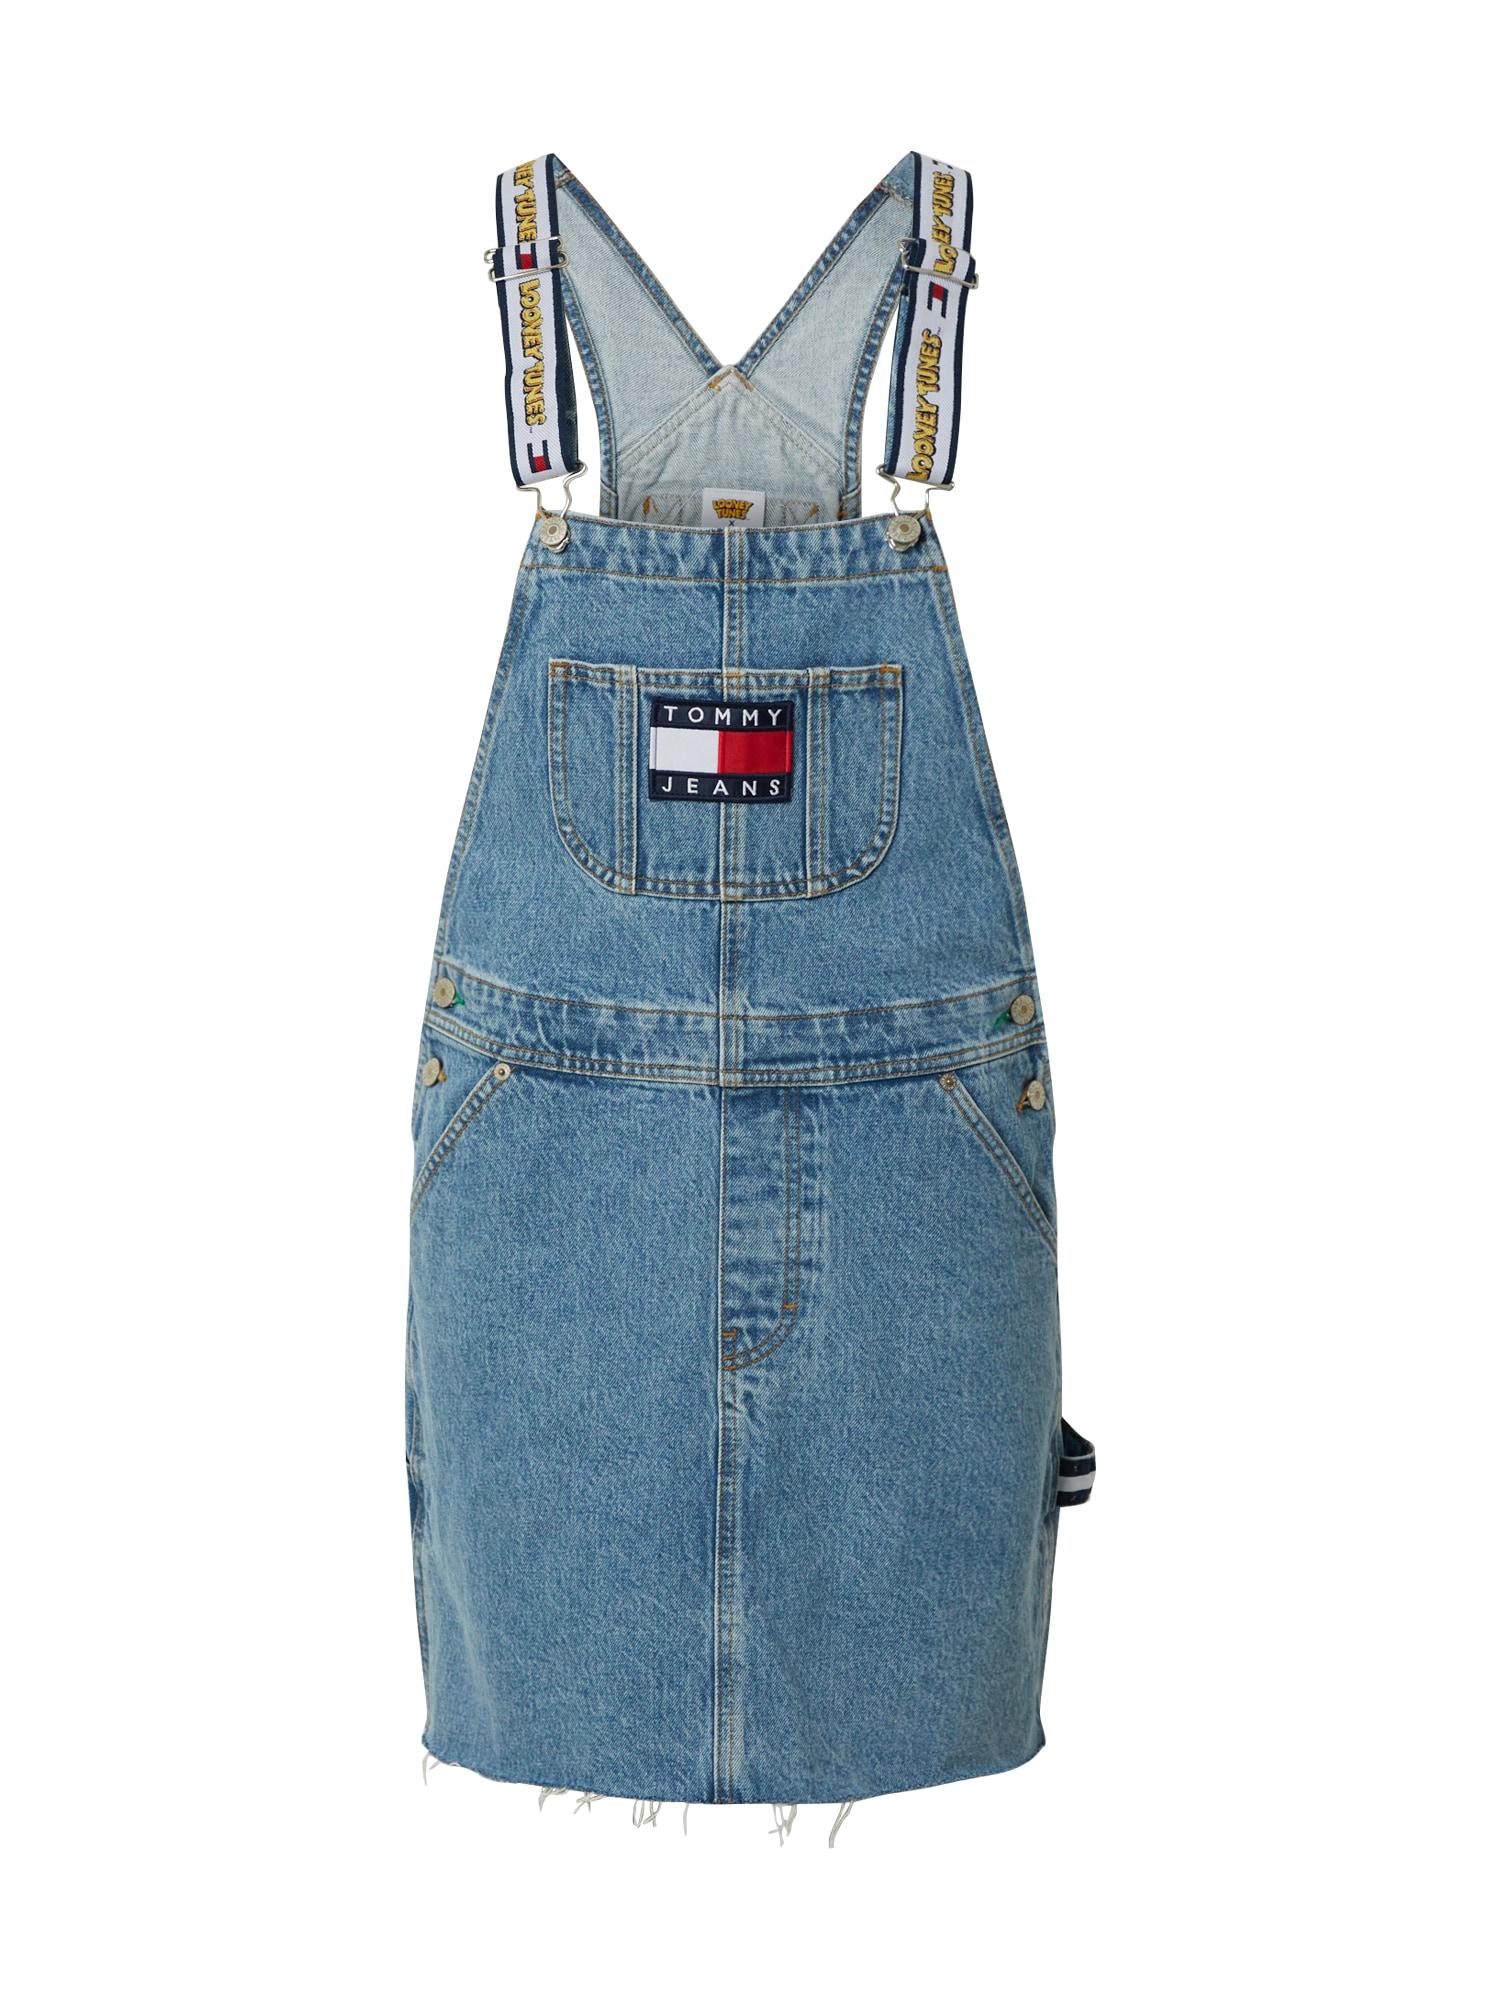 Tommy Jeans Suknelė 'LOONEY TUNES' tamsiai (džinso) mėlyna